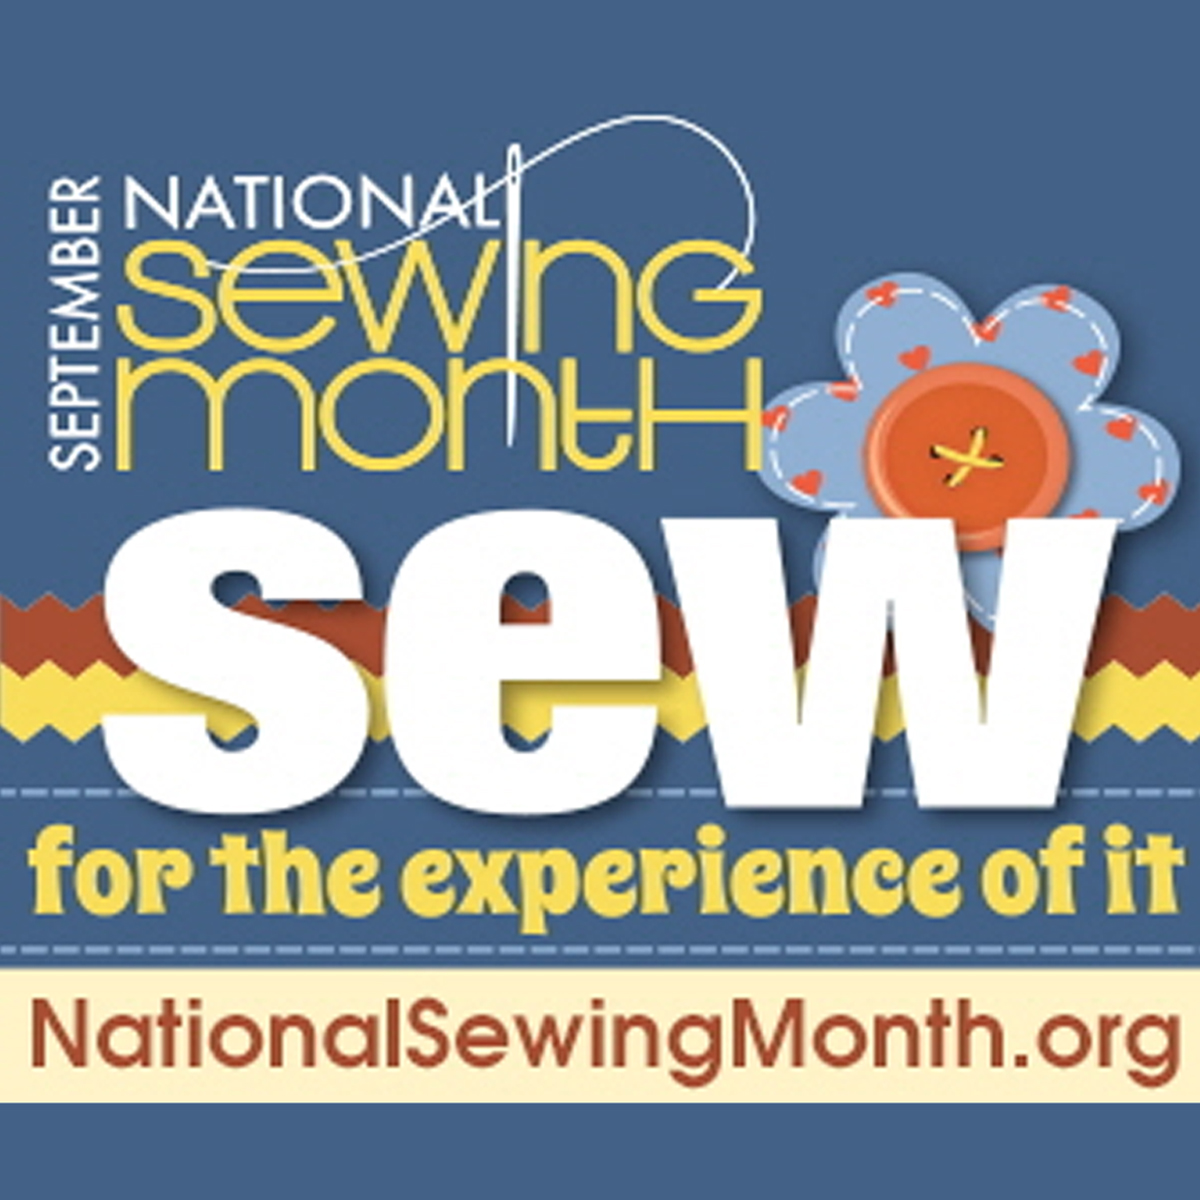 national sewing month logo 2.jpg